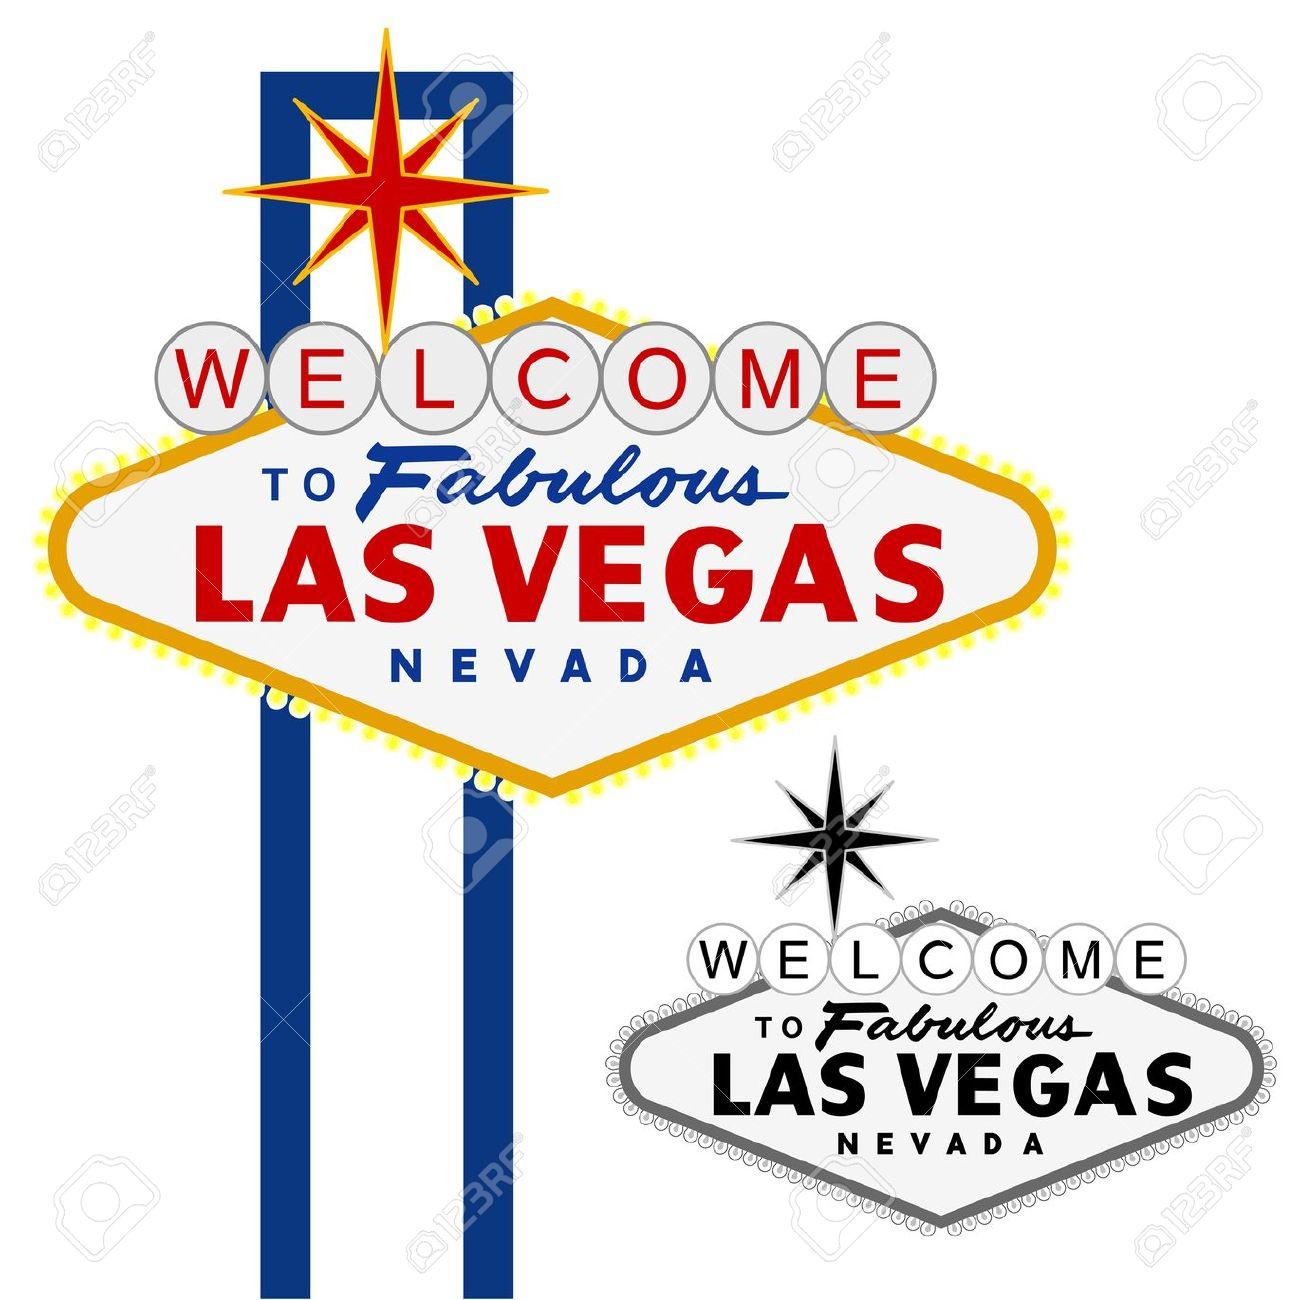 Vegas plane clipart vector free download Vegas desktop clipart - ClipartFox vector free download